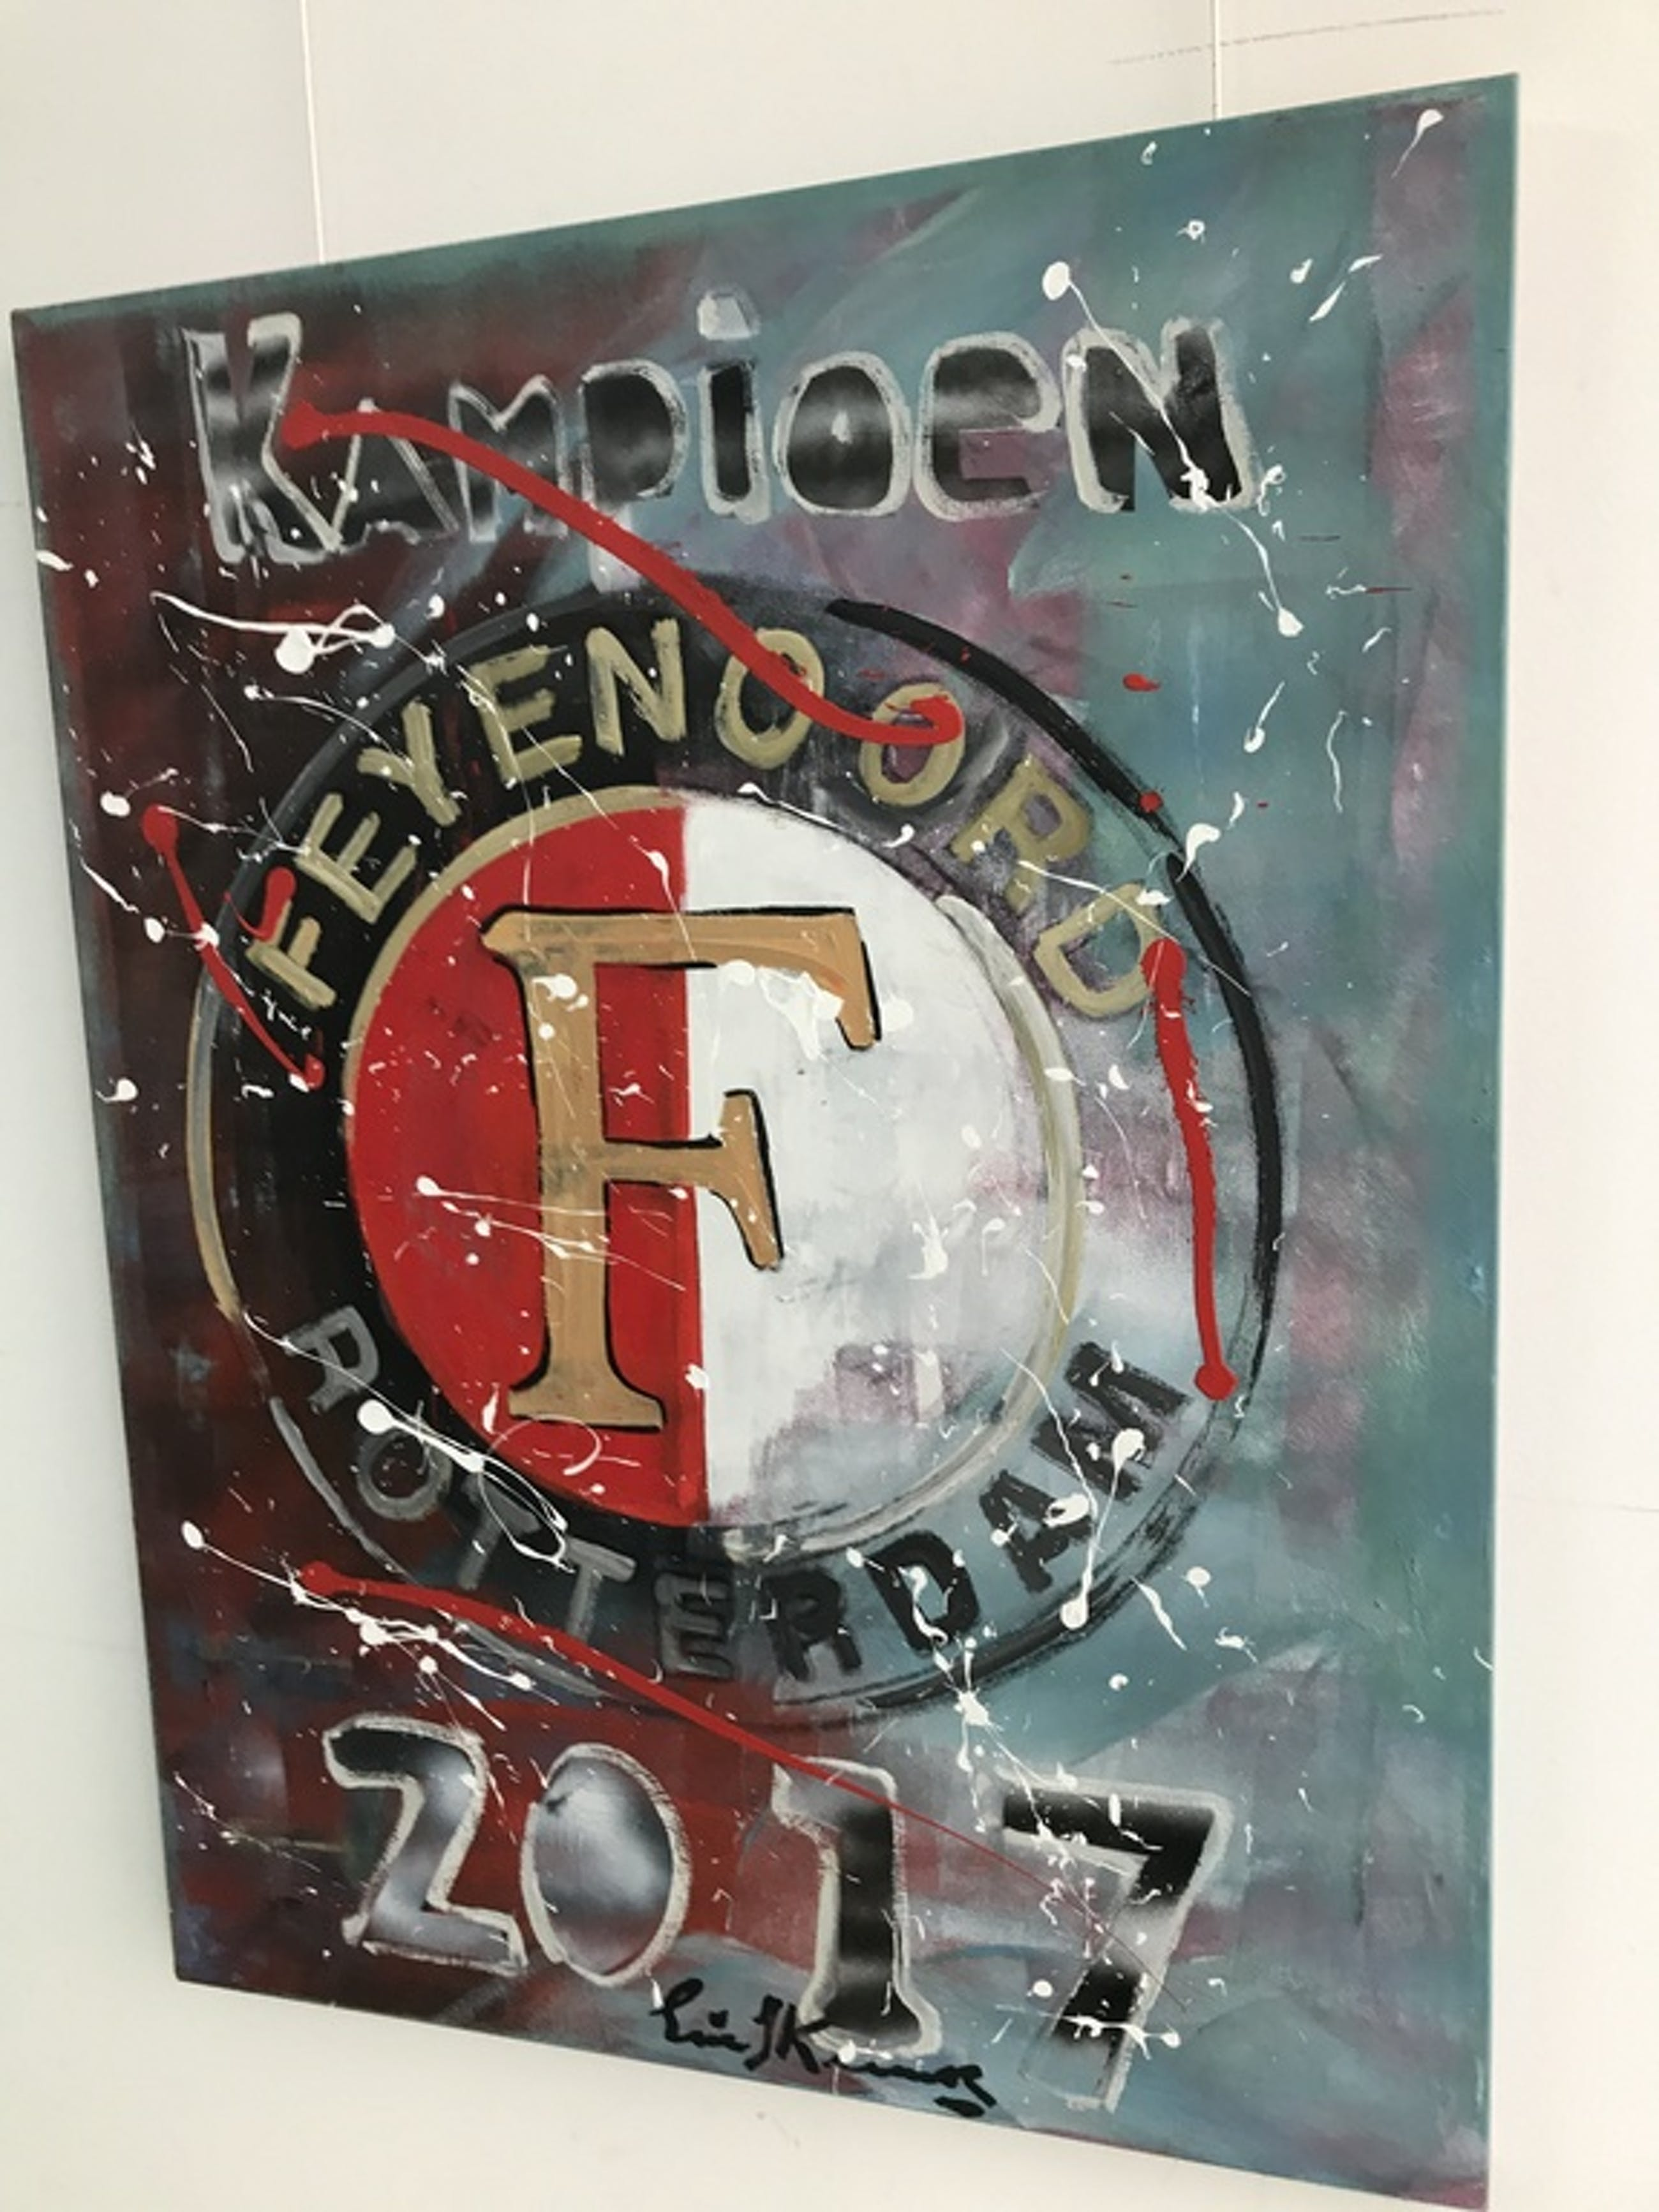 ERIC JAN KREMER FEYENOORD ROTTERDAM 2017 kopen? Bied vanaf 650!